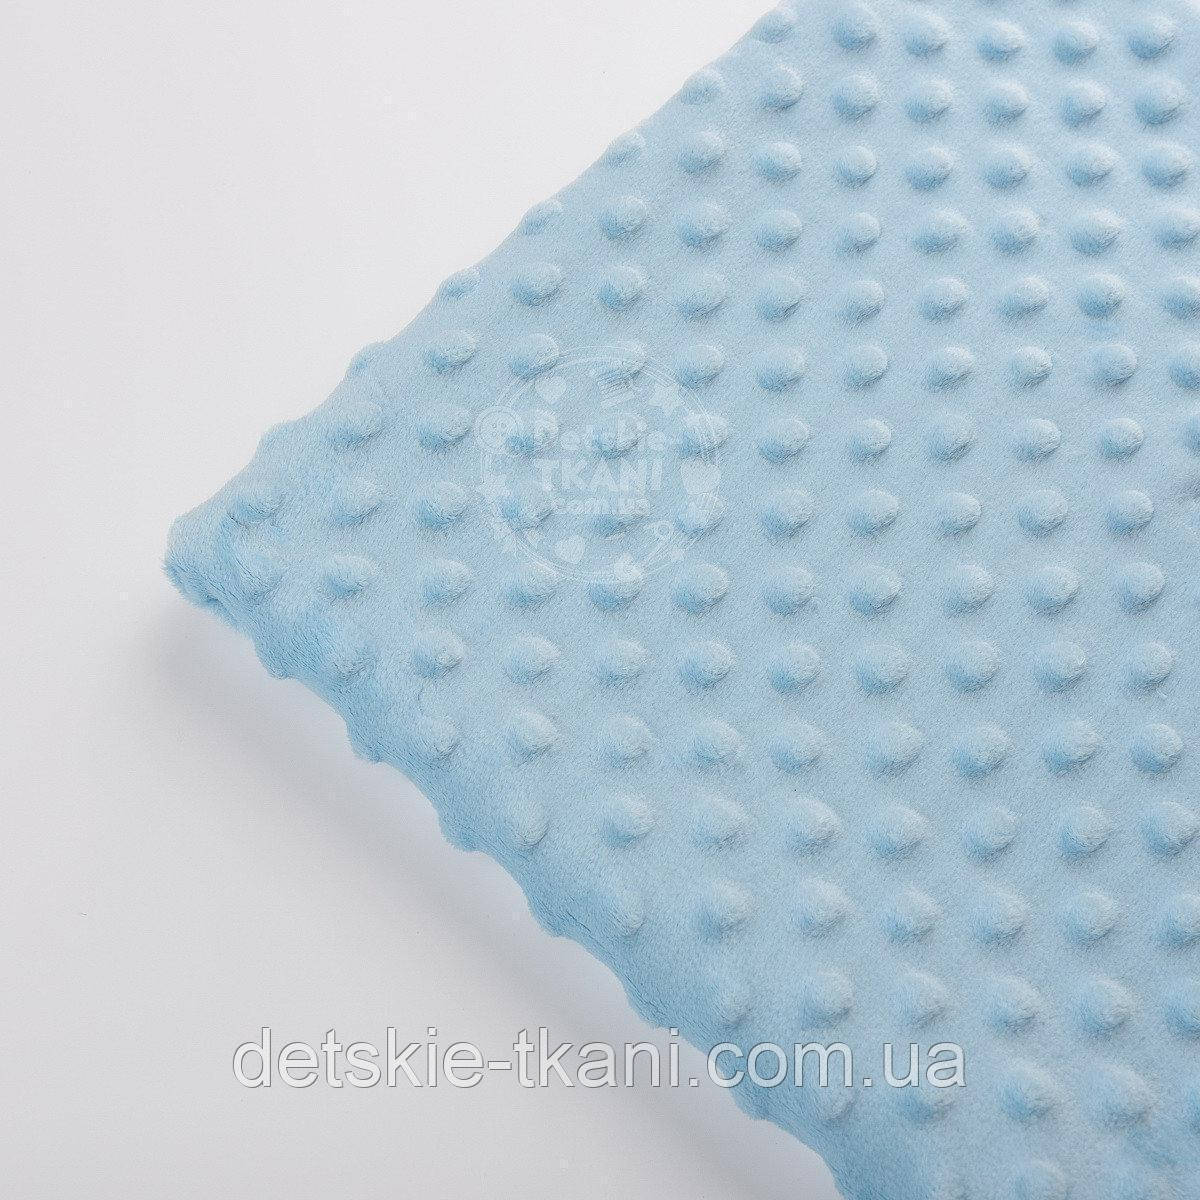 Лоскут ткани М-6 плюш минки голубого цвета, размер 65*160 см